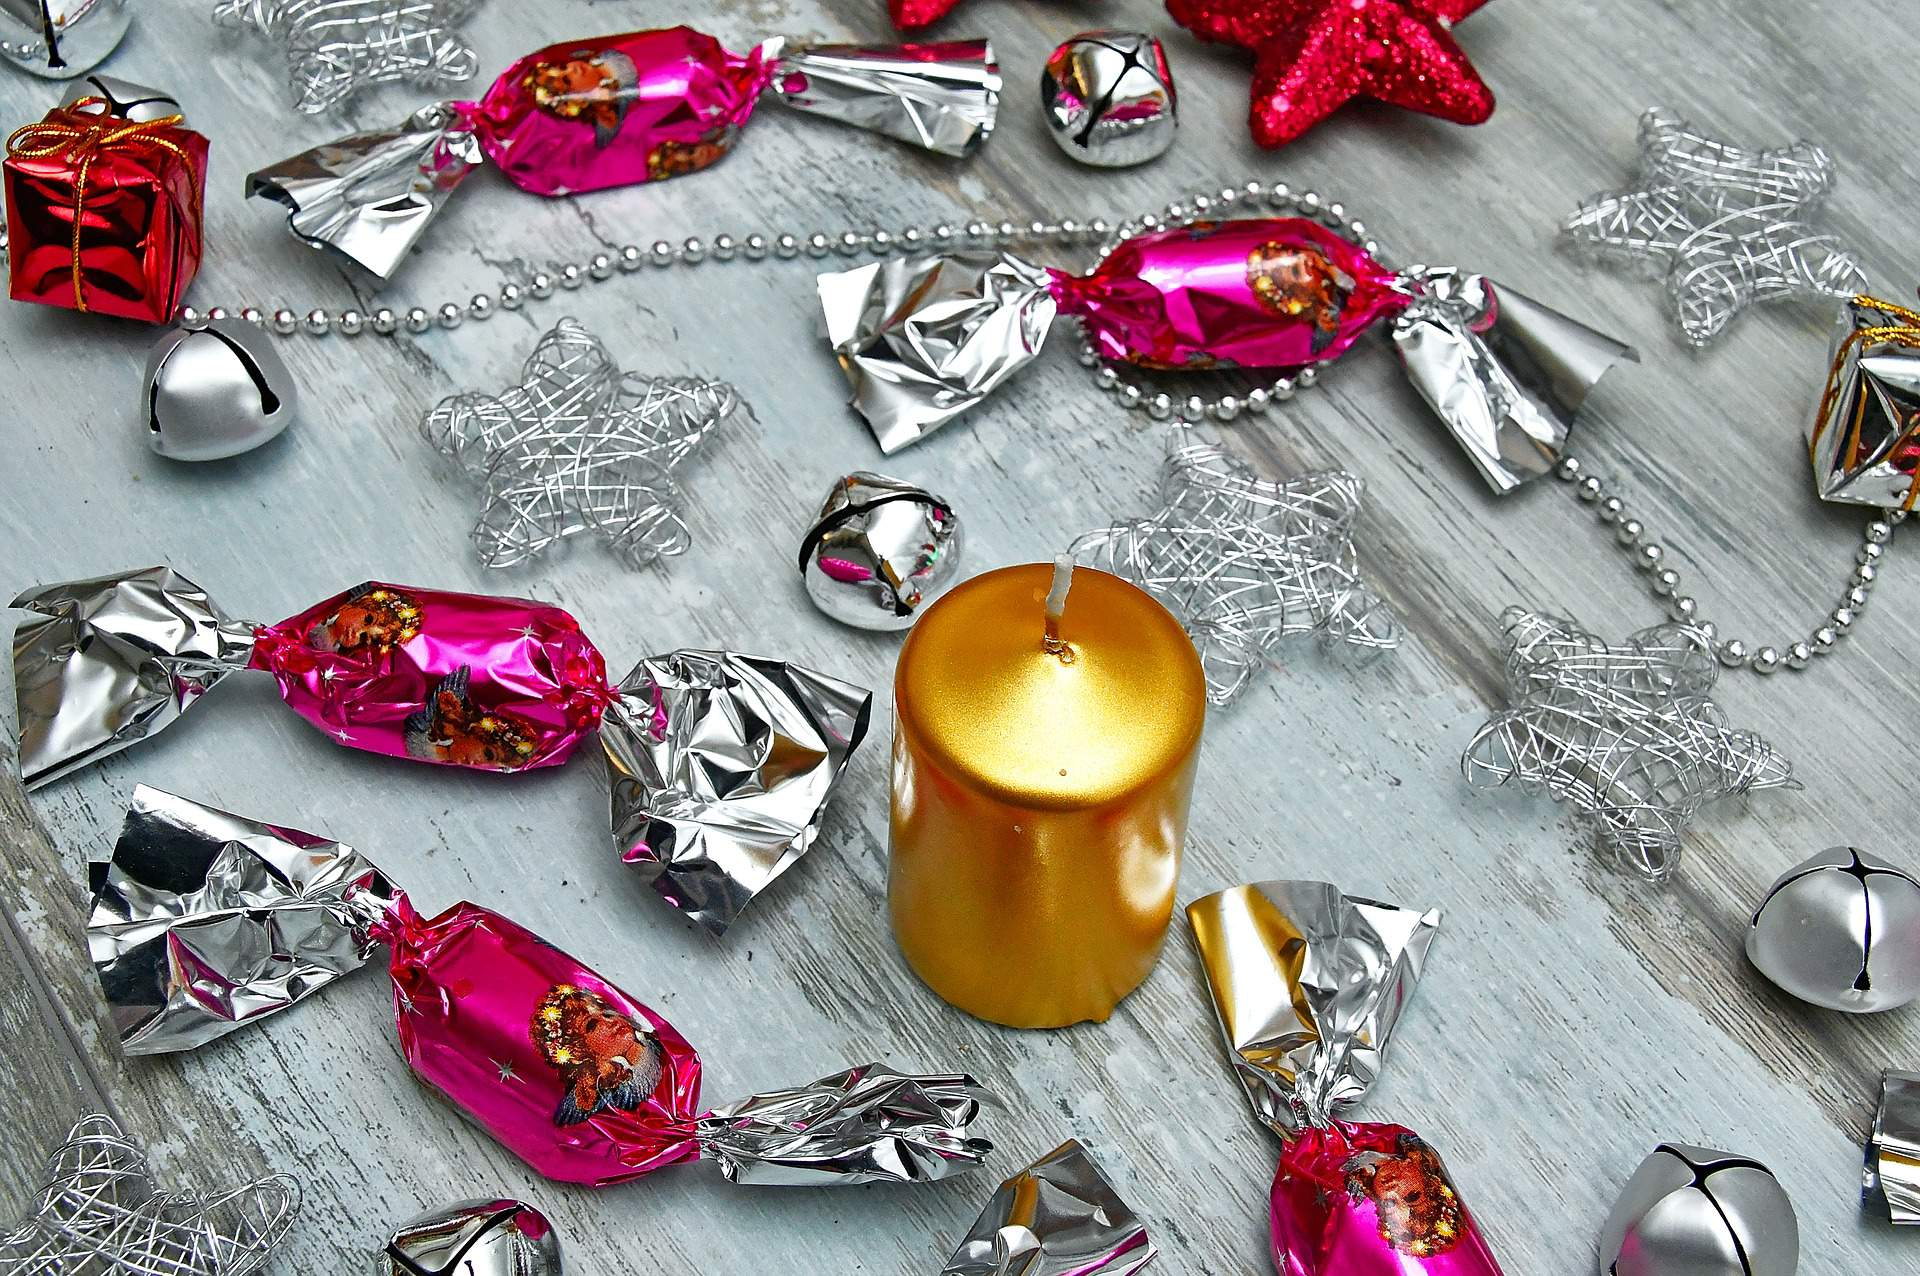 szaloncukor, Christmas, decoration